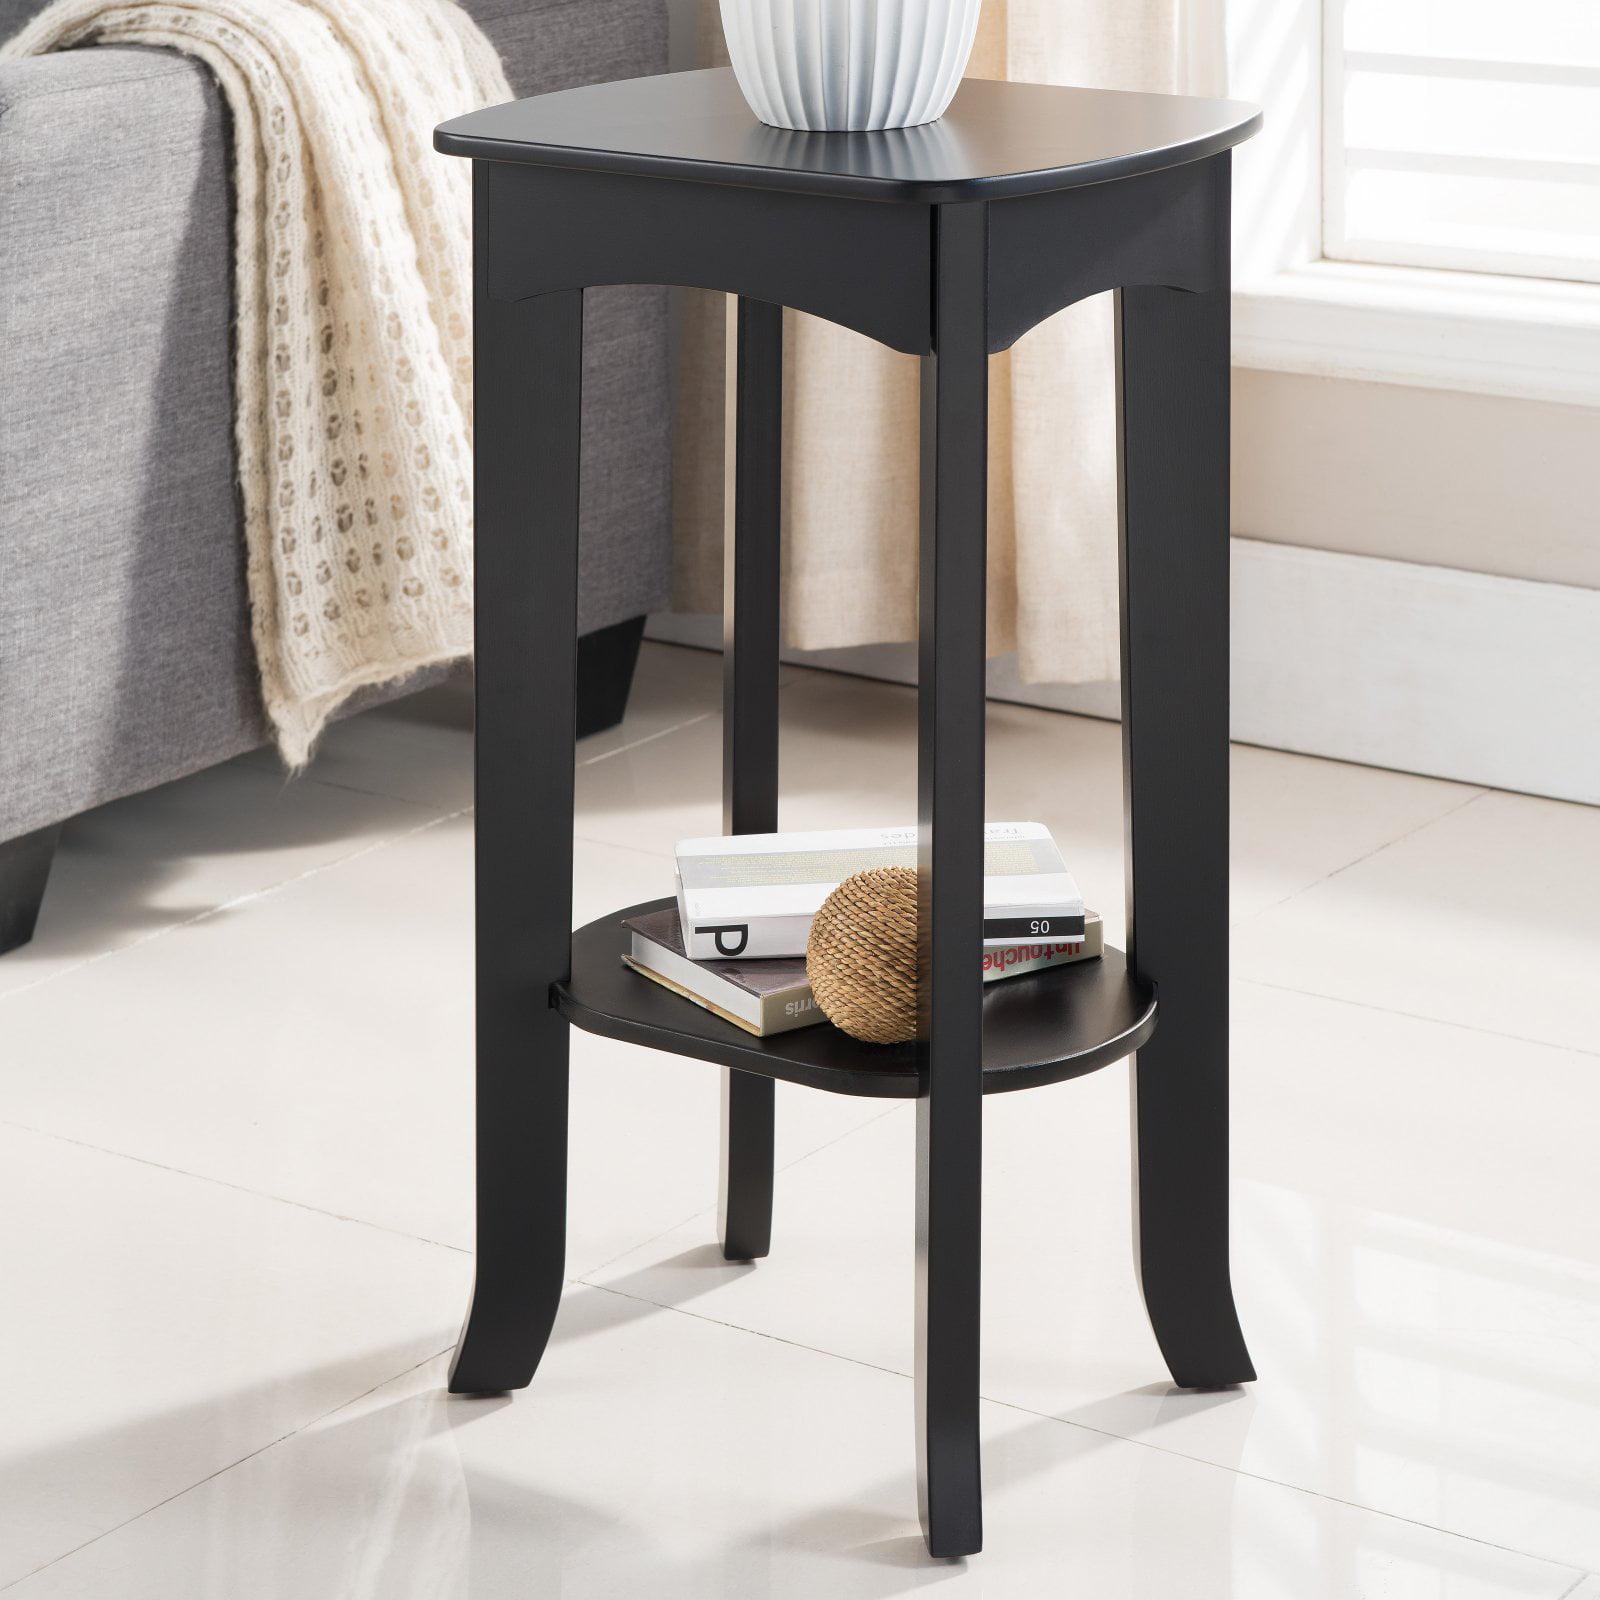 K & B Furniture Plant Stand - Espresso